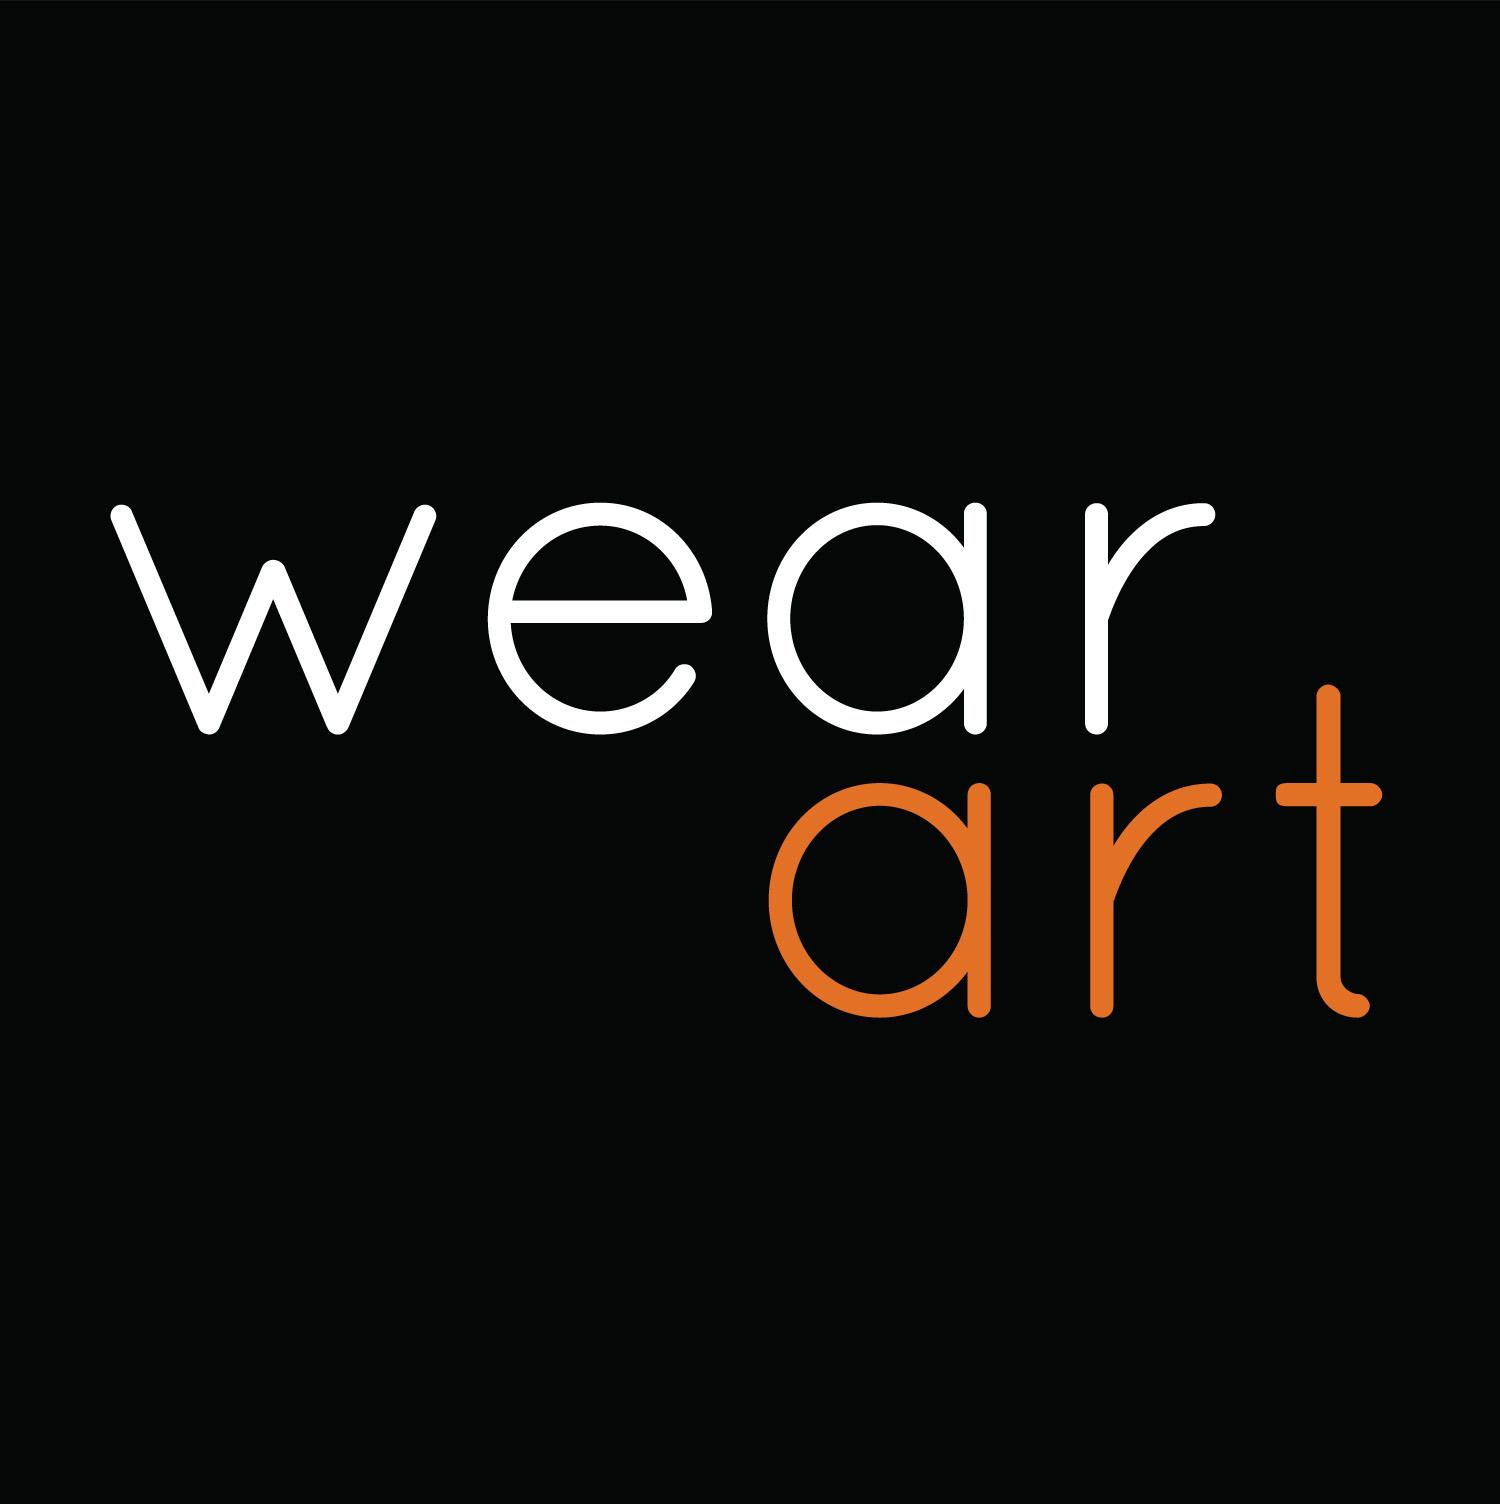 wear art nyc - dena paige fischer & andrew blaize bovasso